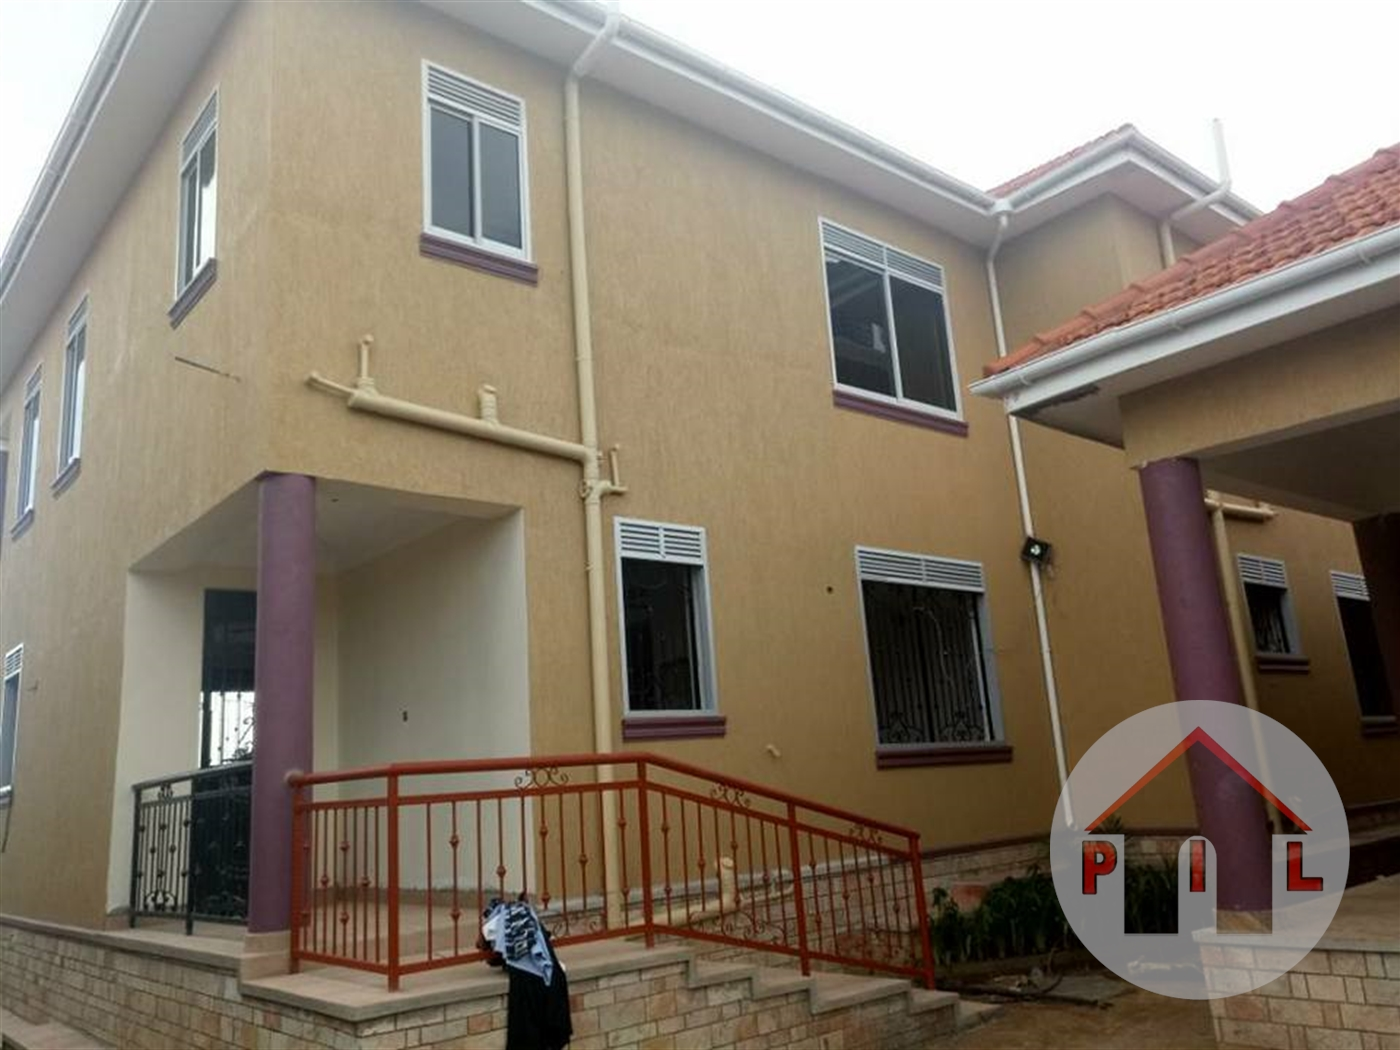 Apartment block for sale in Luzira Wakiso